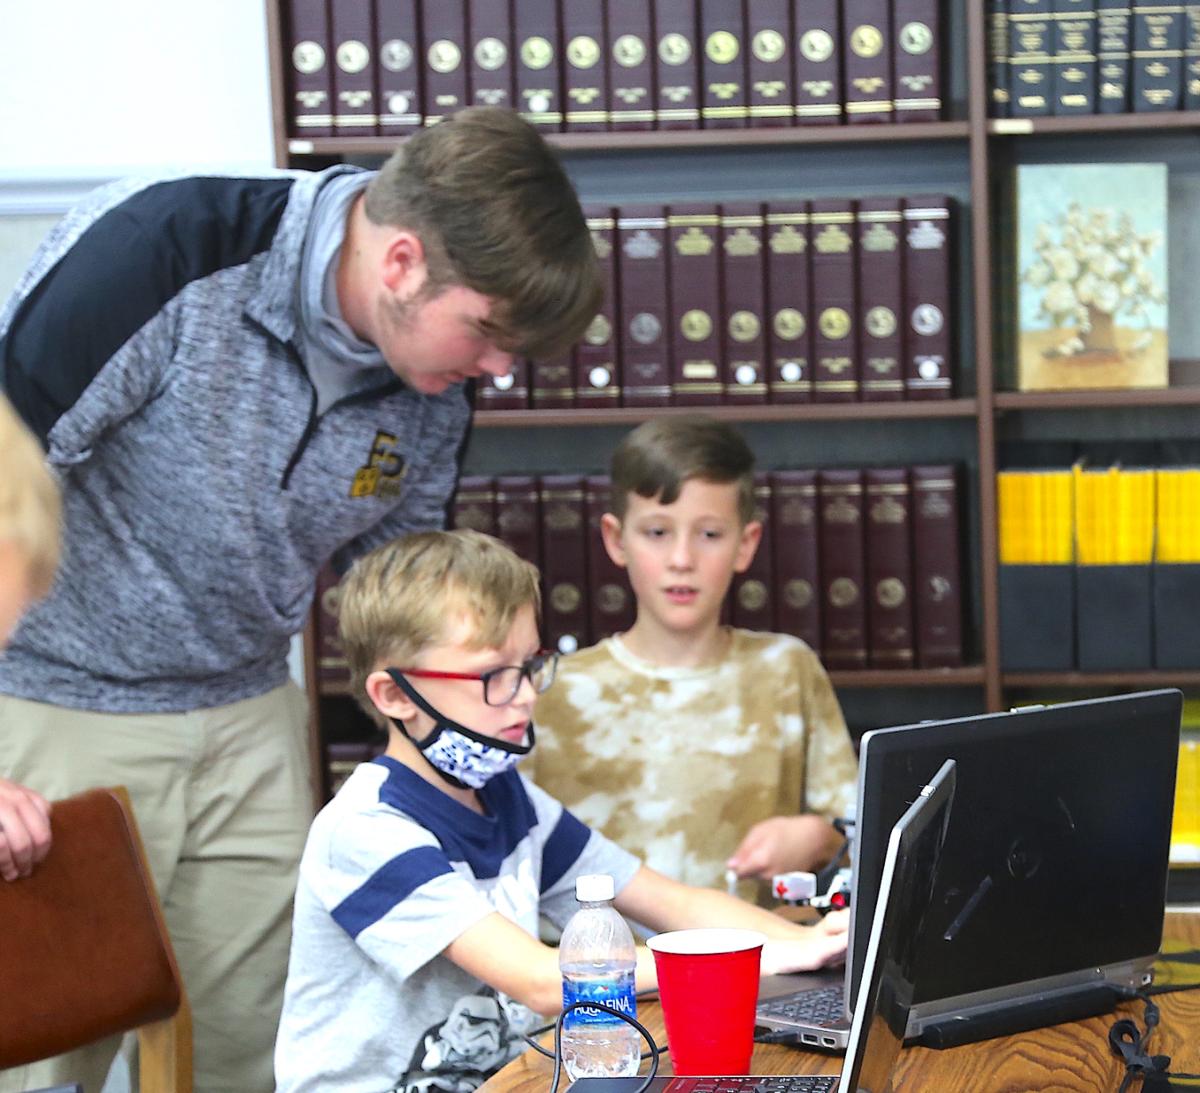 Robotics team connects STEM to community